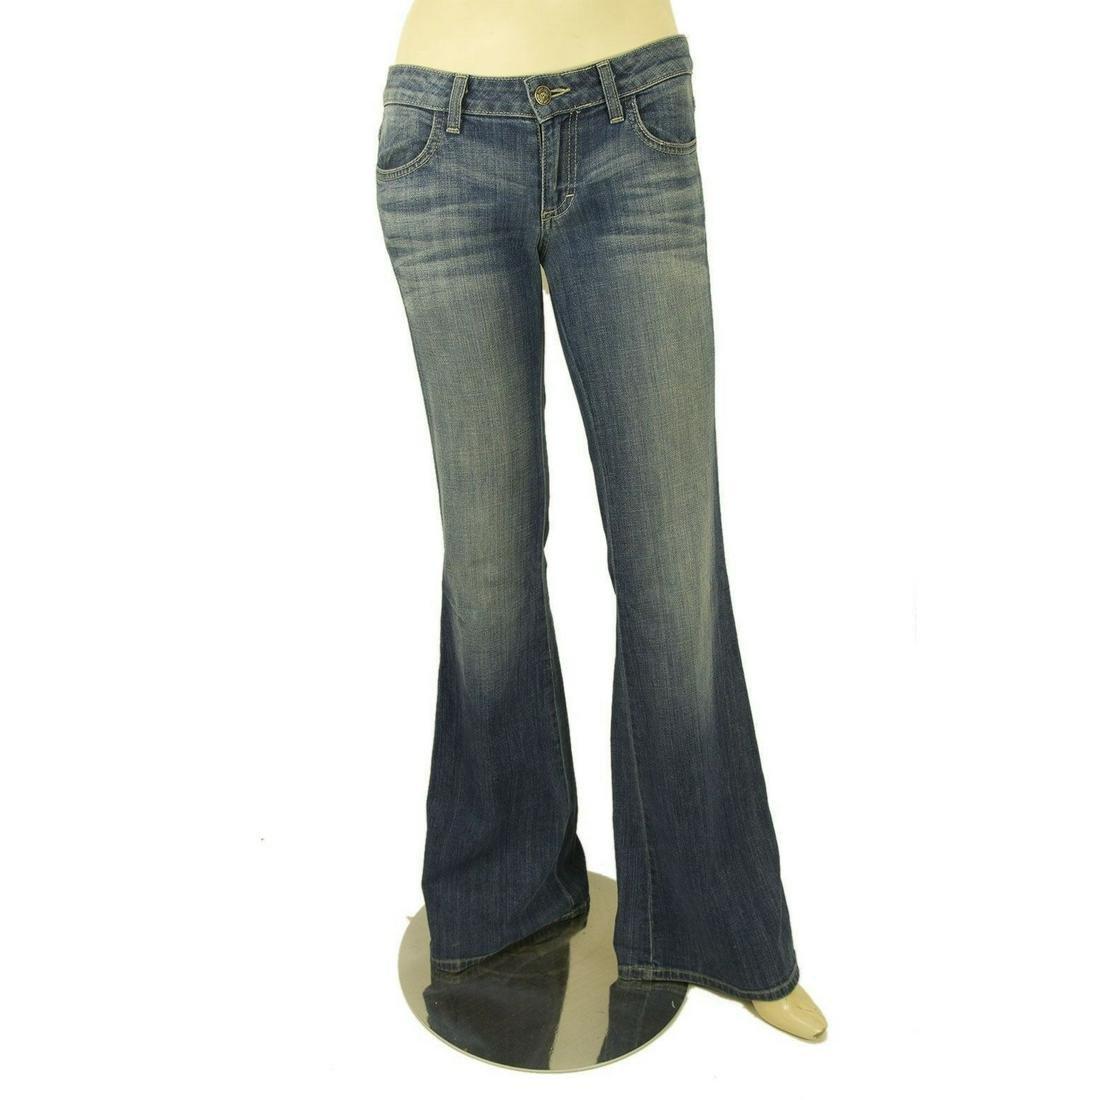 Siwy USA Anita Blue Washed Bootcut Boot Cut Jeans Denim